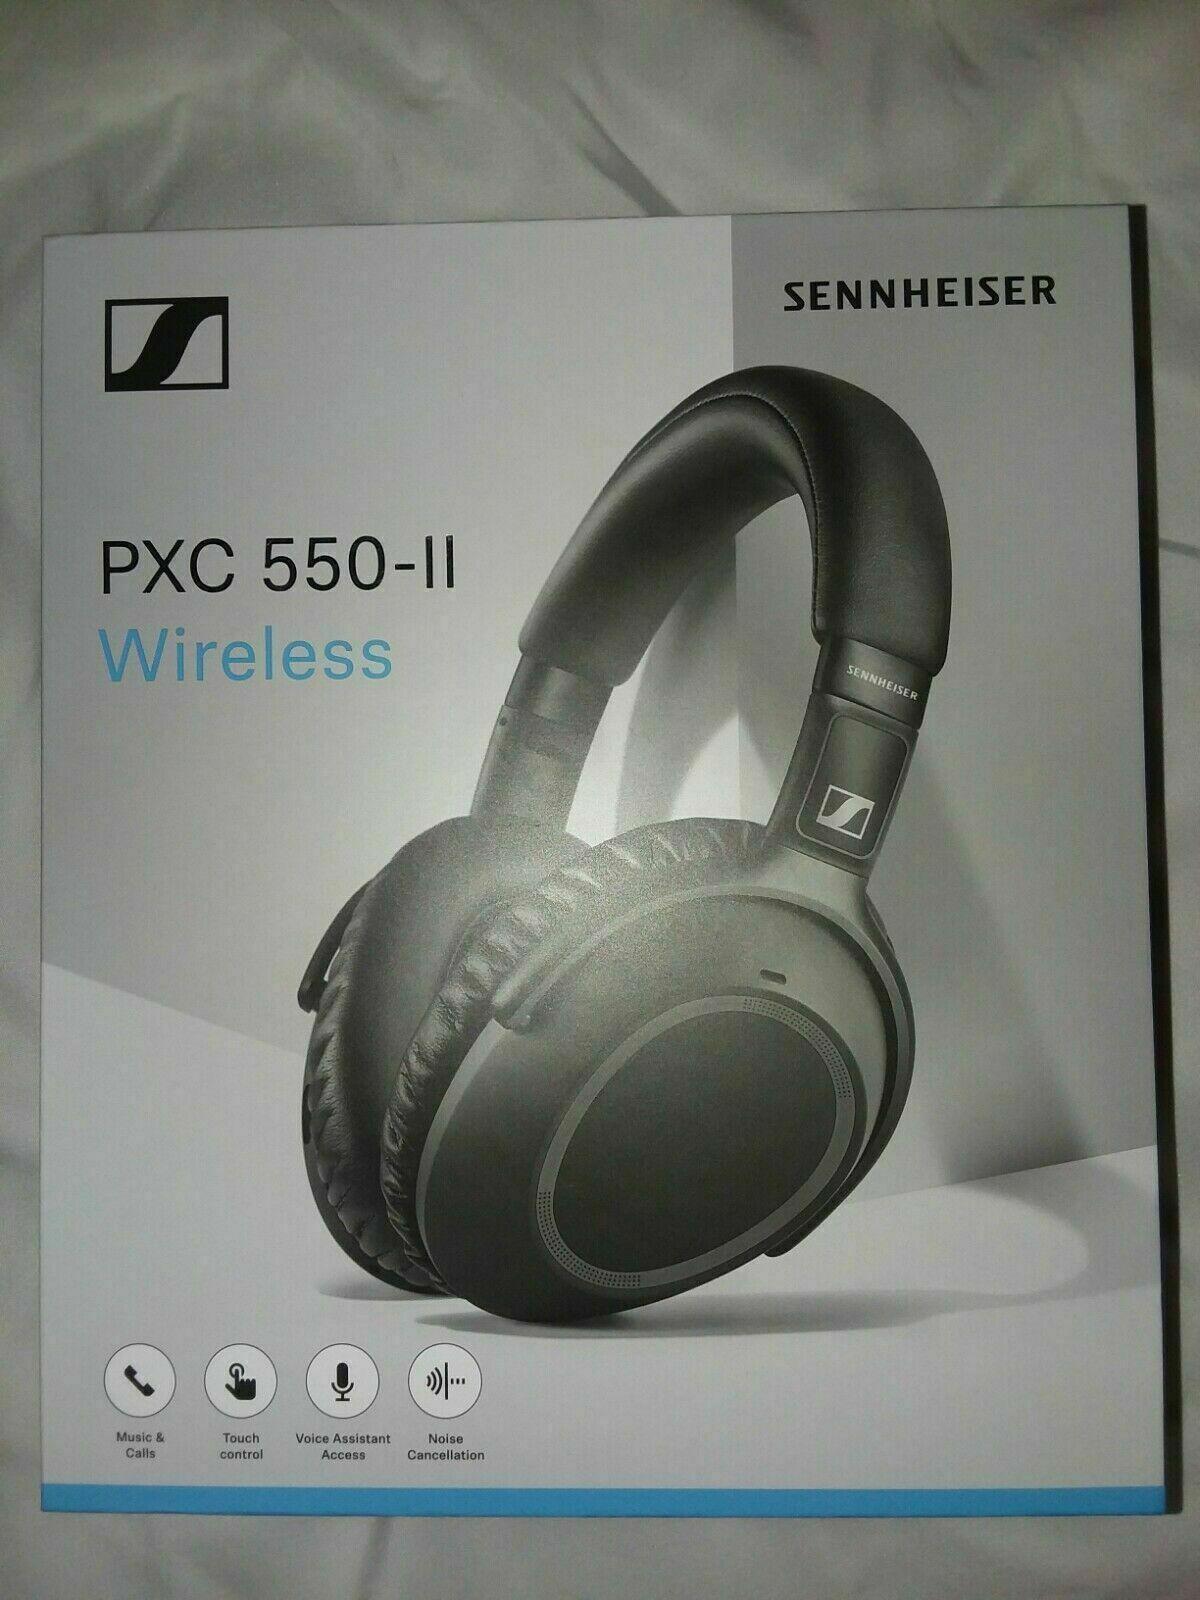 Sennheiser PXC 550 Wireless Bluetooth Headset